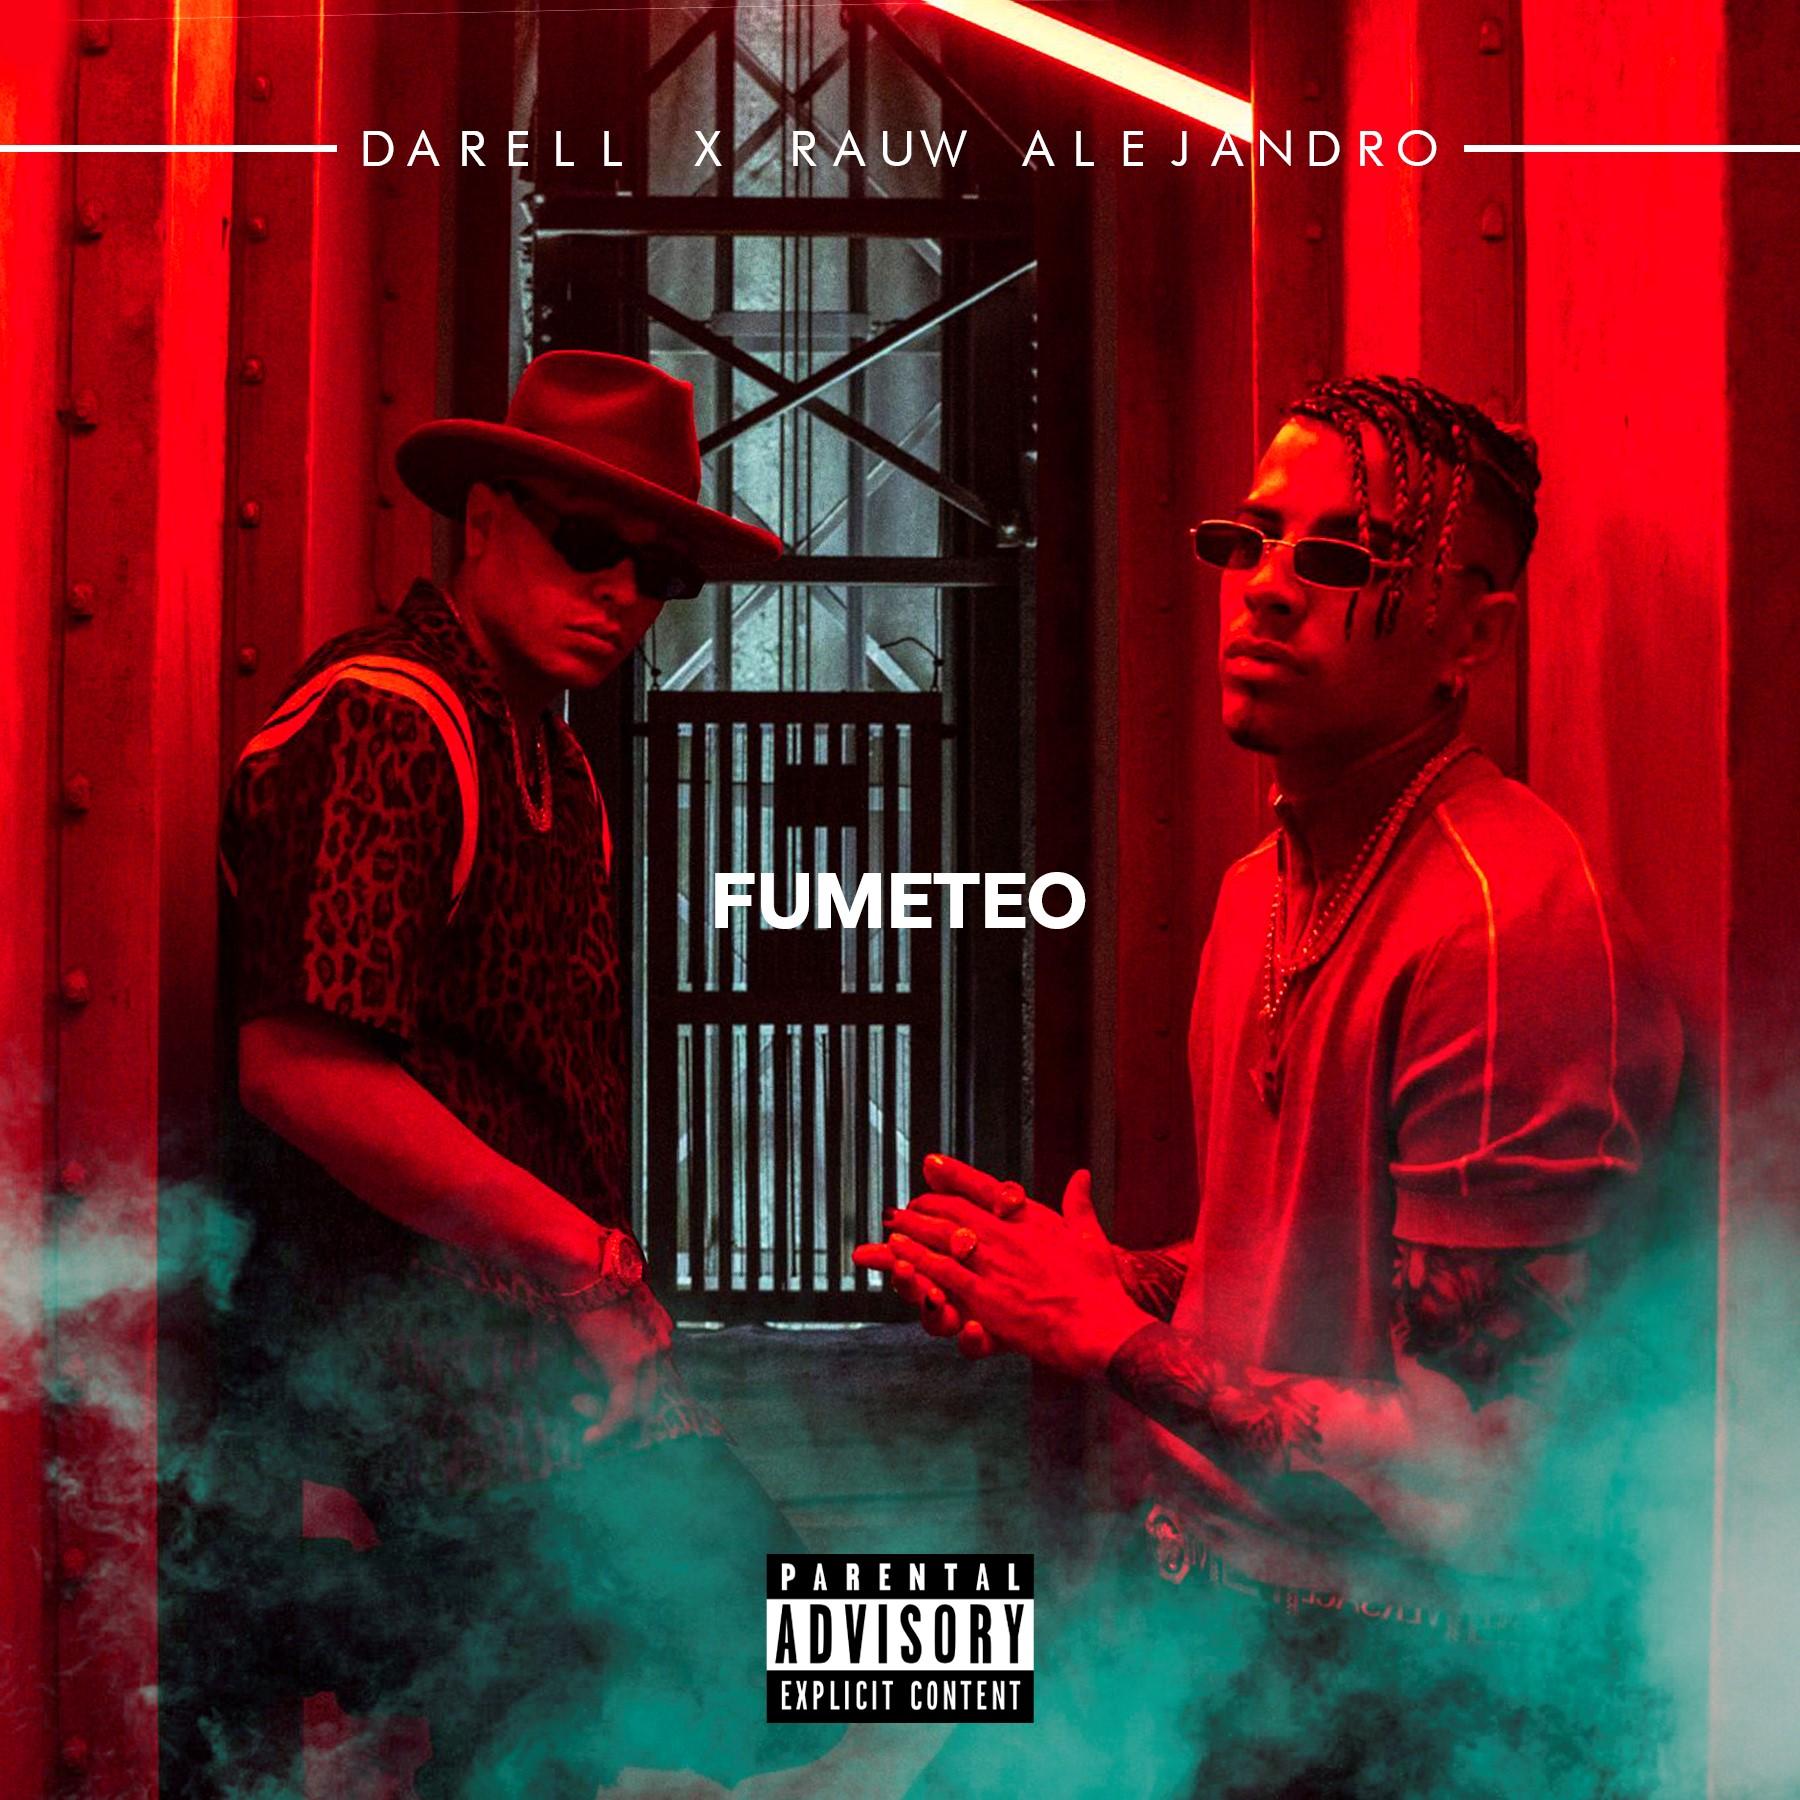 Darell_Fumeteo